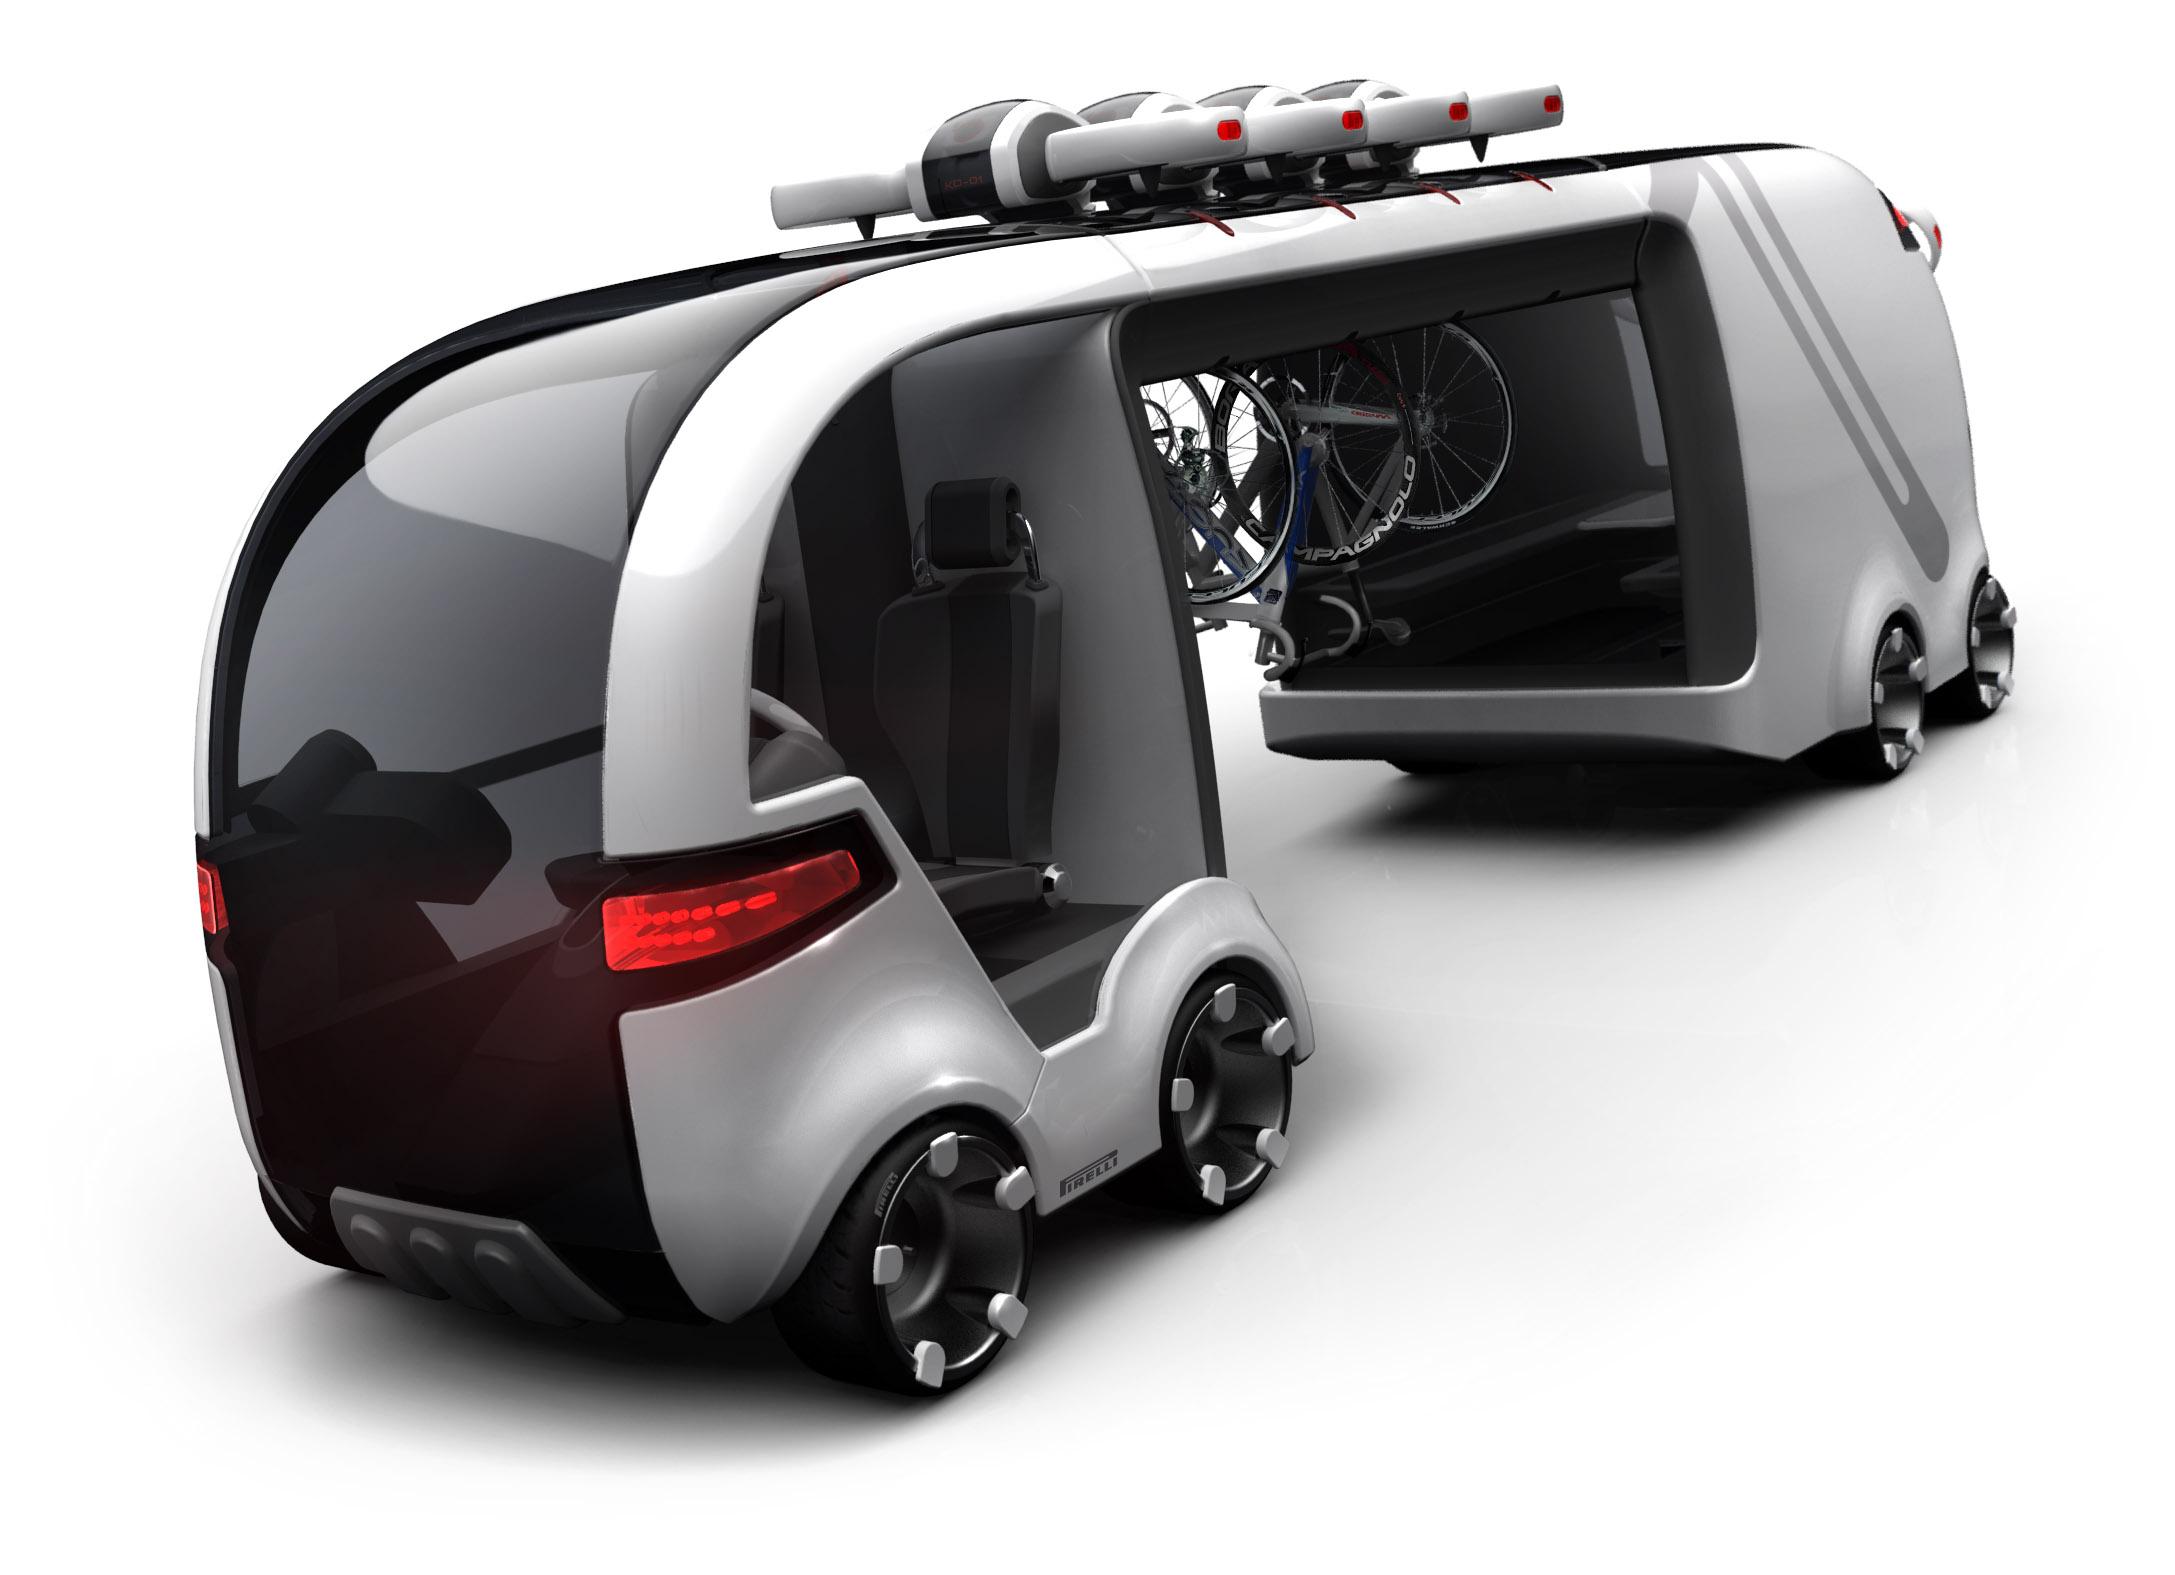 Industrial Design - Besenwagen Tour de France Designkonzept - Florian Mack